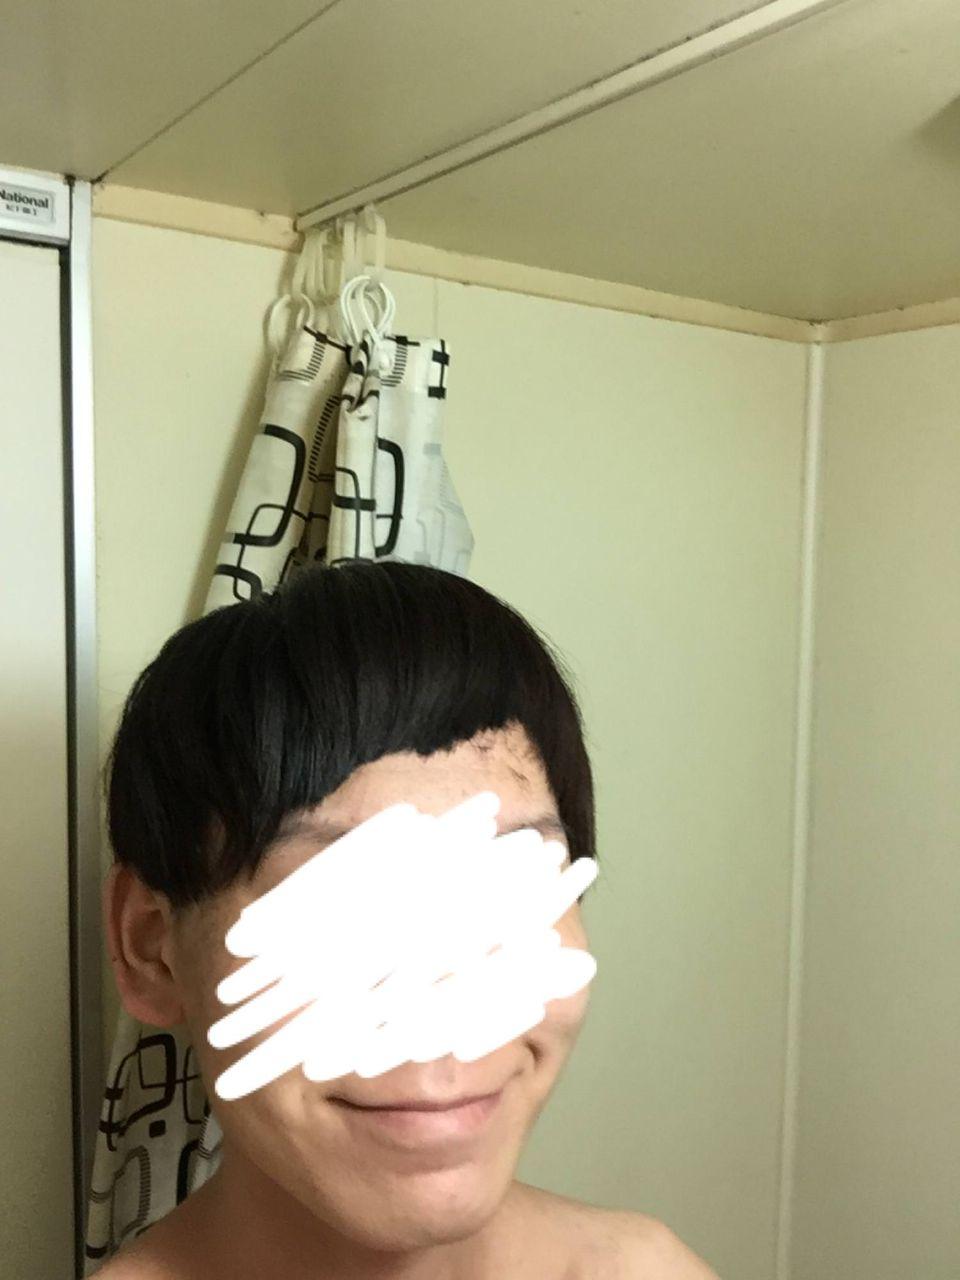 01afeb8b.jpg